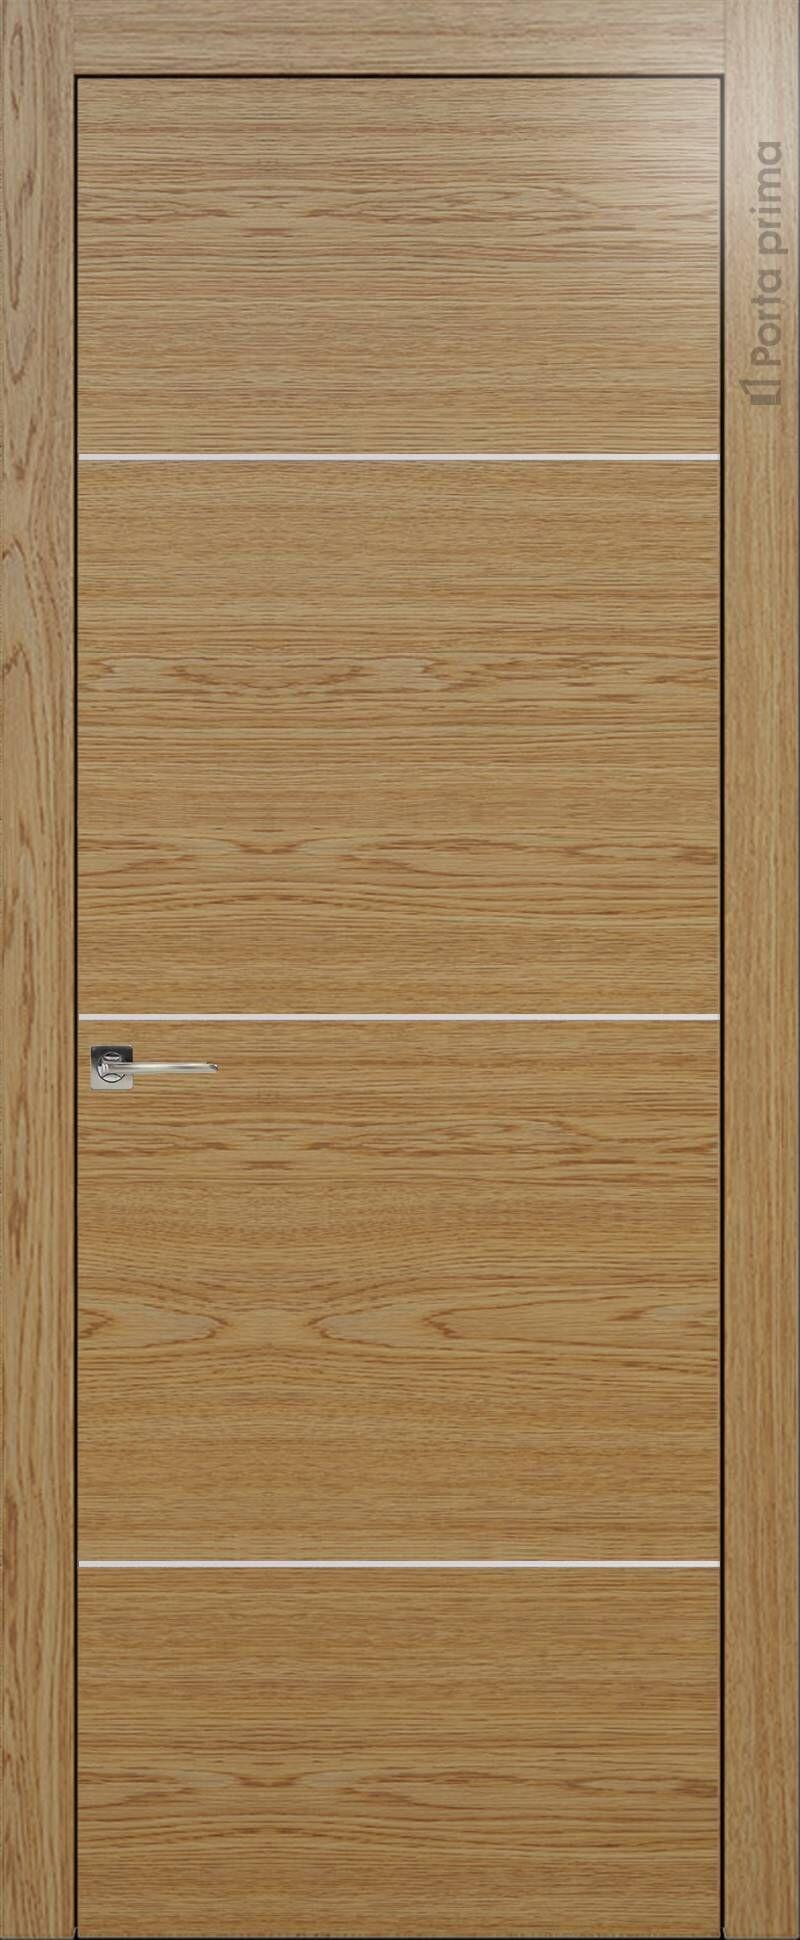 Tivoli Г-3 цвет - Дуб карамель Без стекла (ДГ)